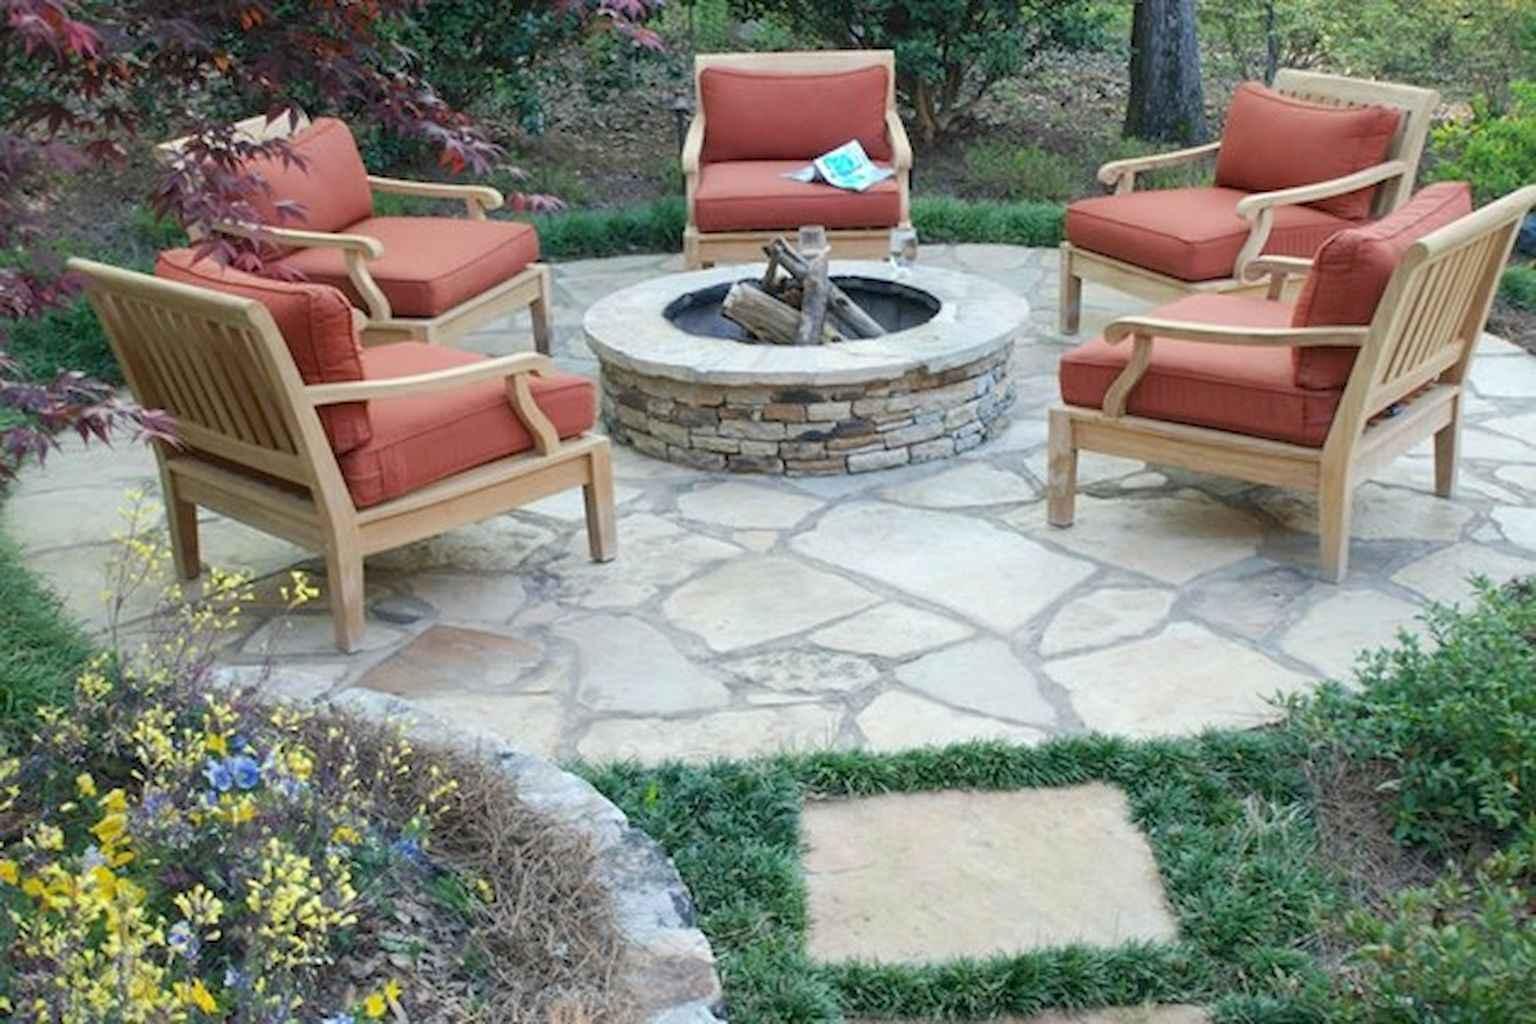 60 Beautiful Backyard Fire Pit Ideas Decoration and Remodel (38)